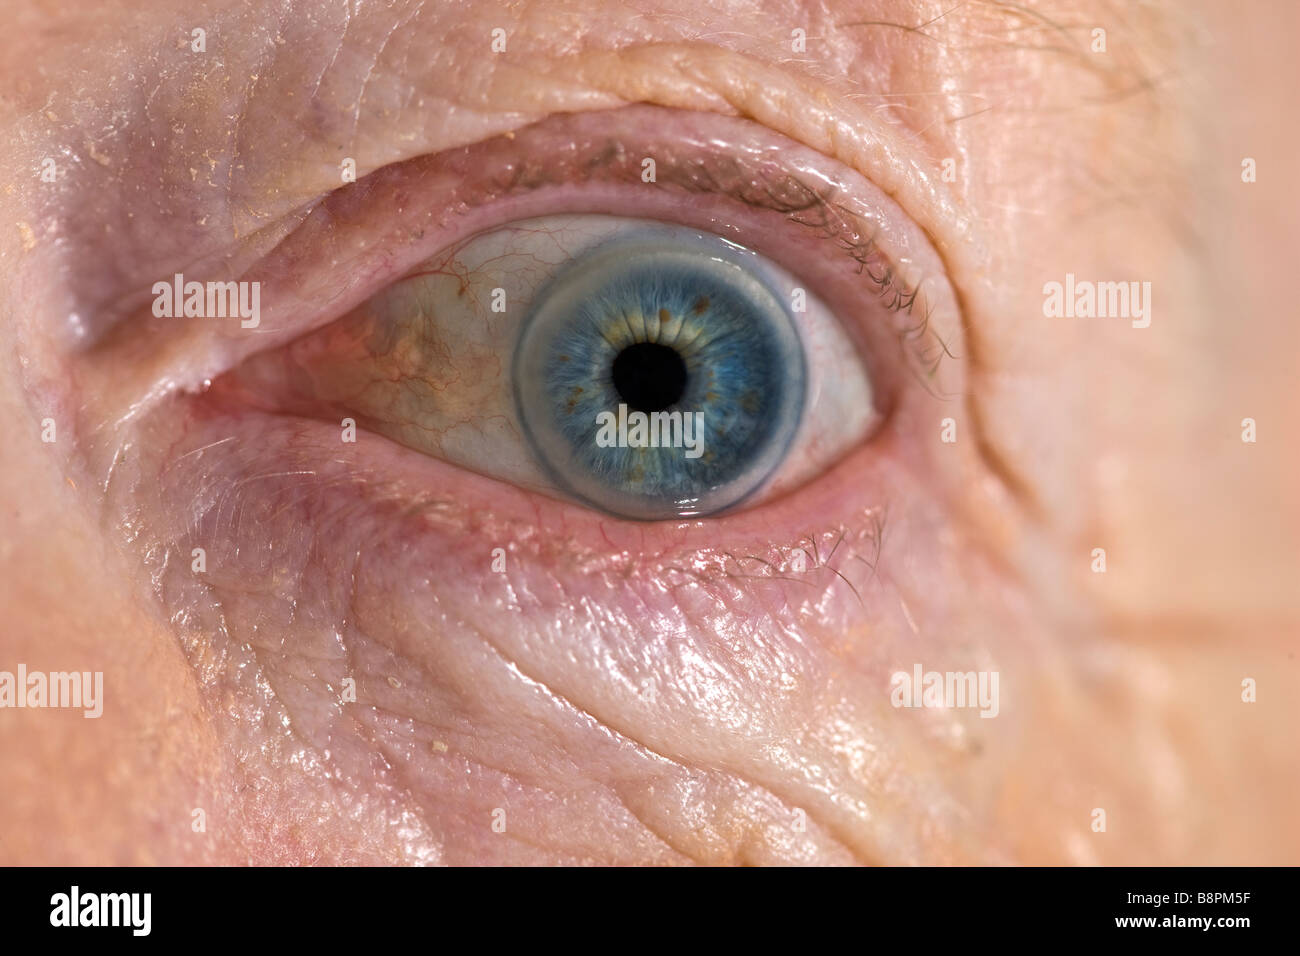 Close up of old ladies eye - Stock Image